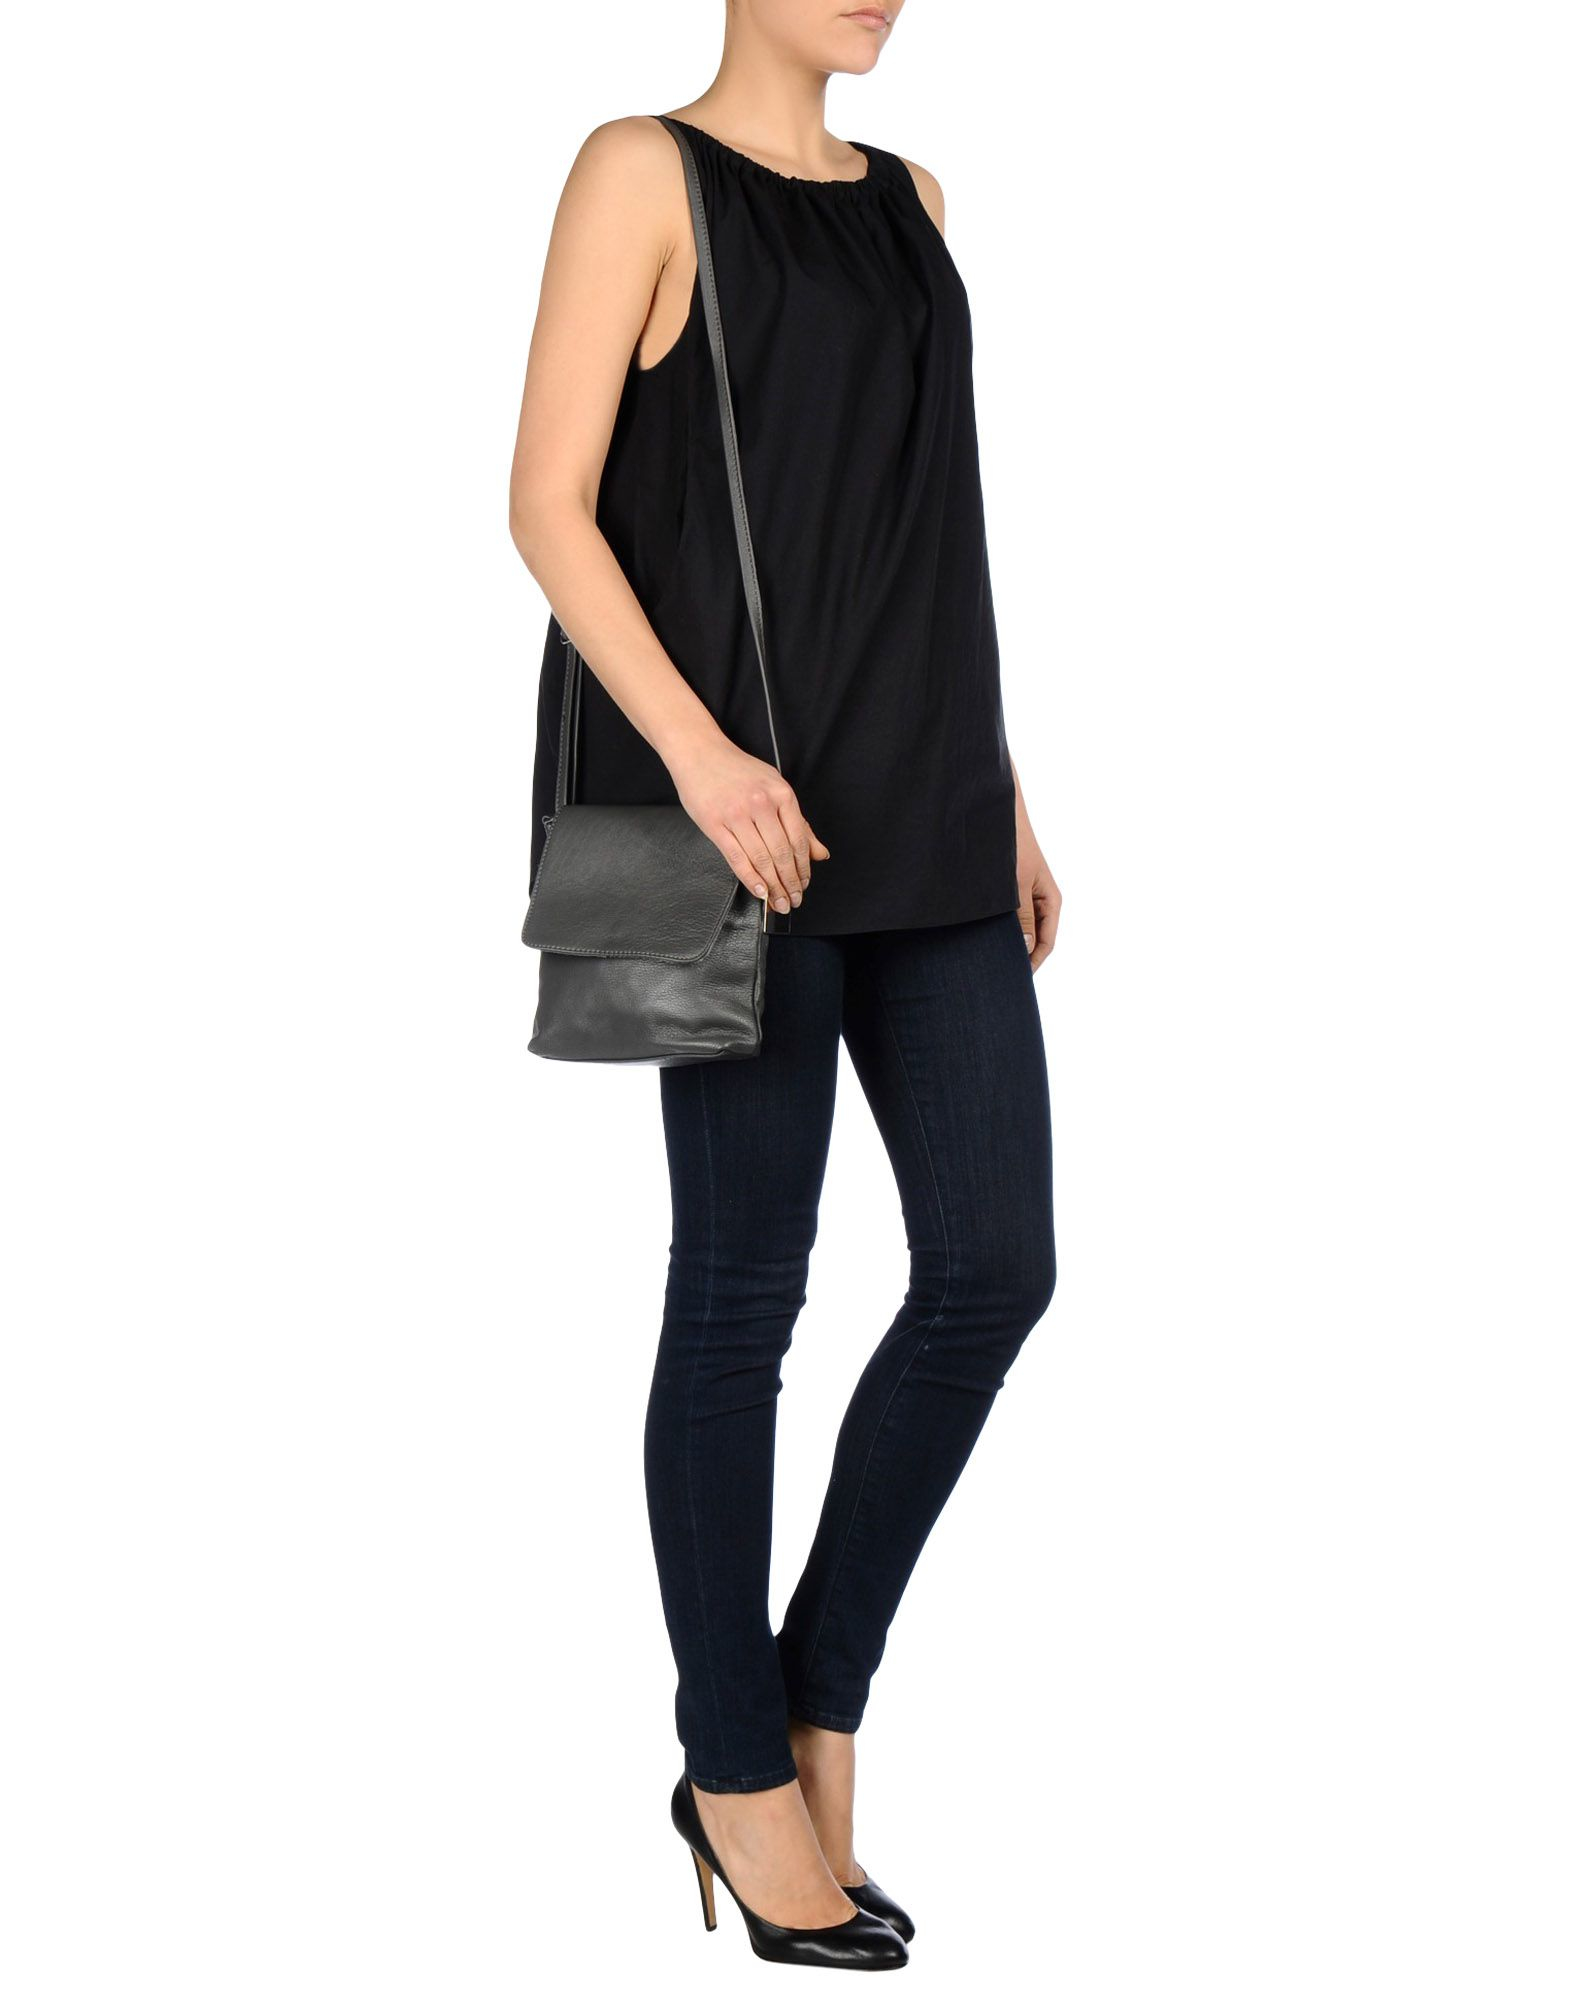 Poema Leather Cross-body Bag in Lead (Grey)